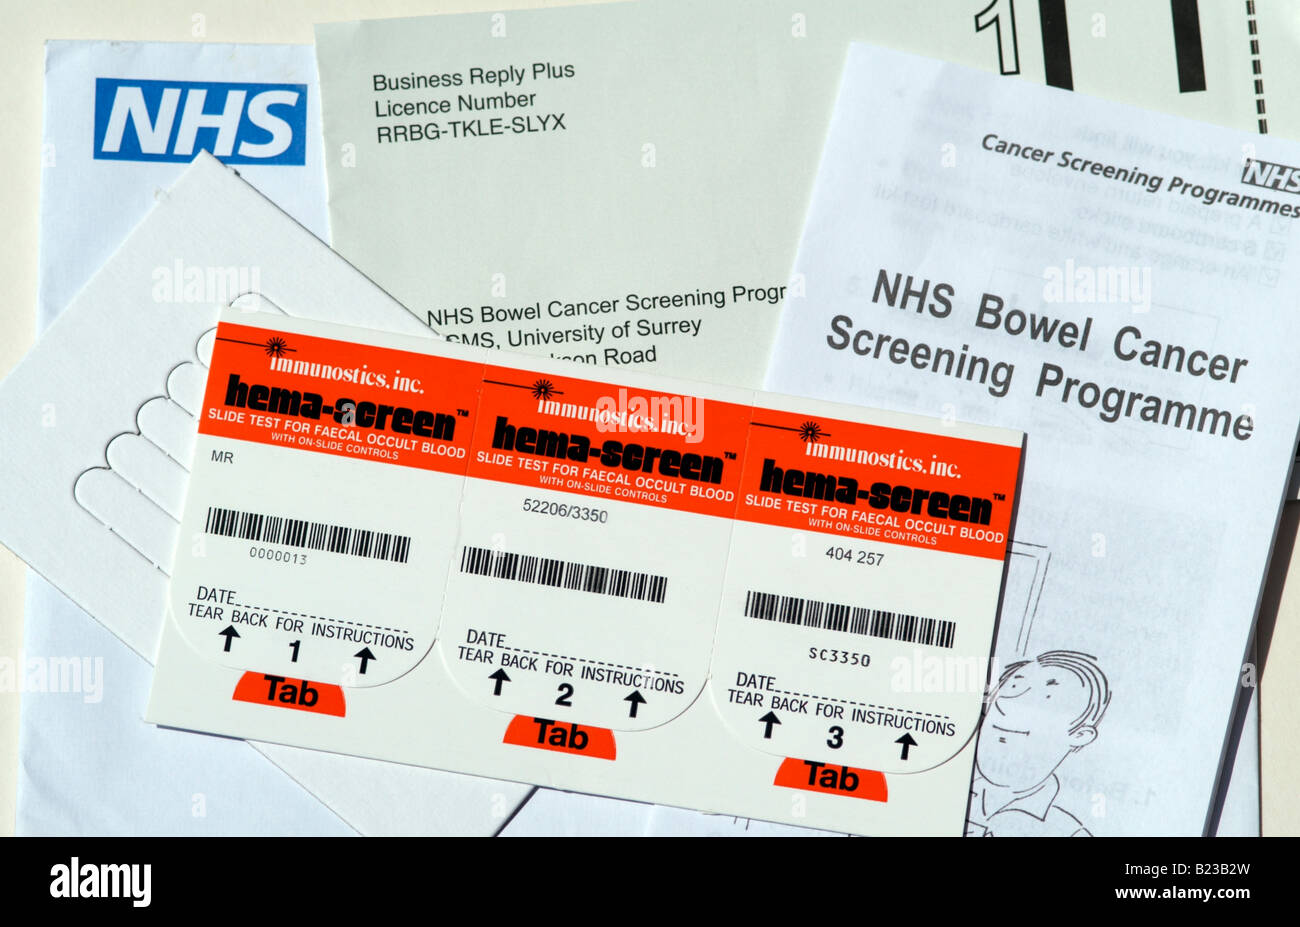 Nhs Bowel Cancer Screening Programme Kit Stock Photo Alamy